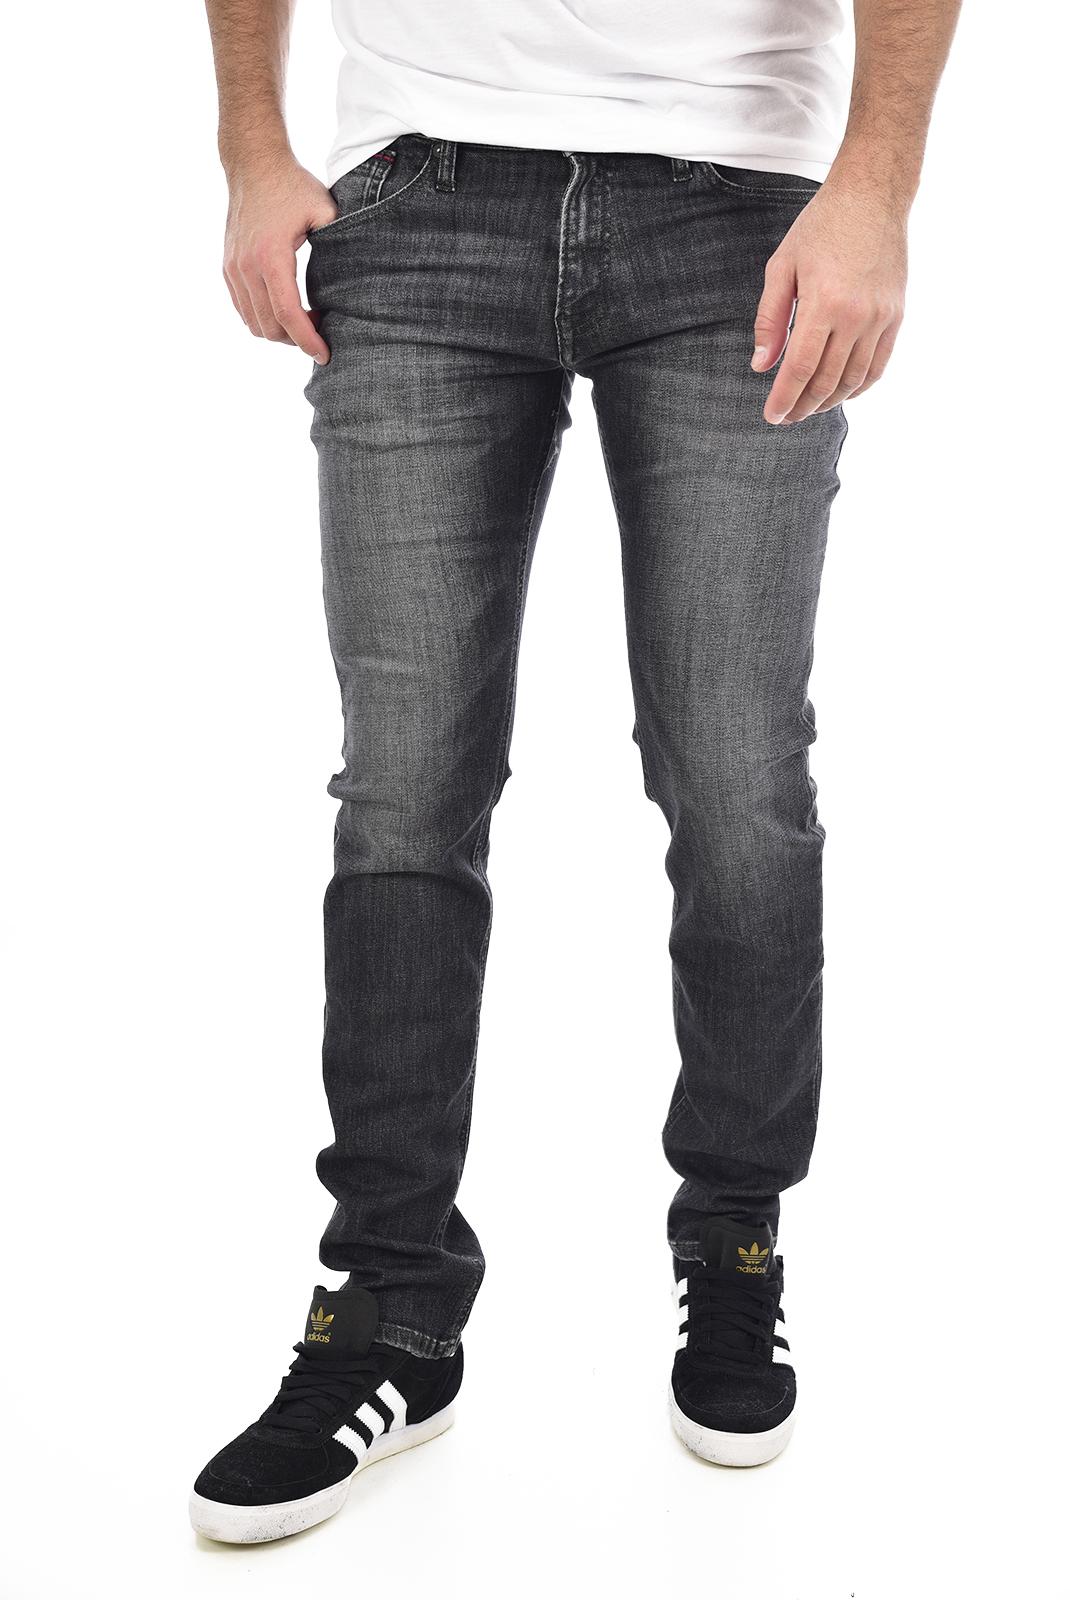 slim / skinny  Tommy Jeans DM0DM06706 scanton 1CD Dynamic Grand Gry St